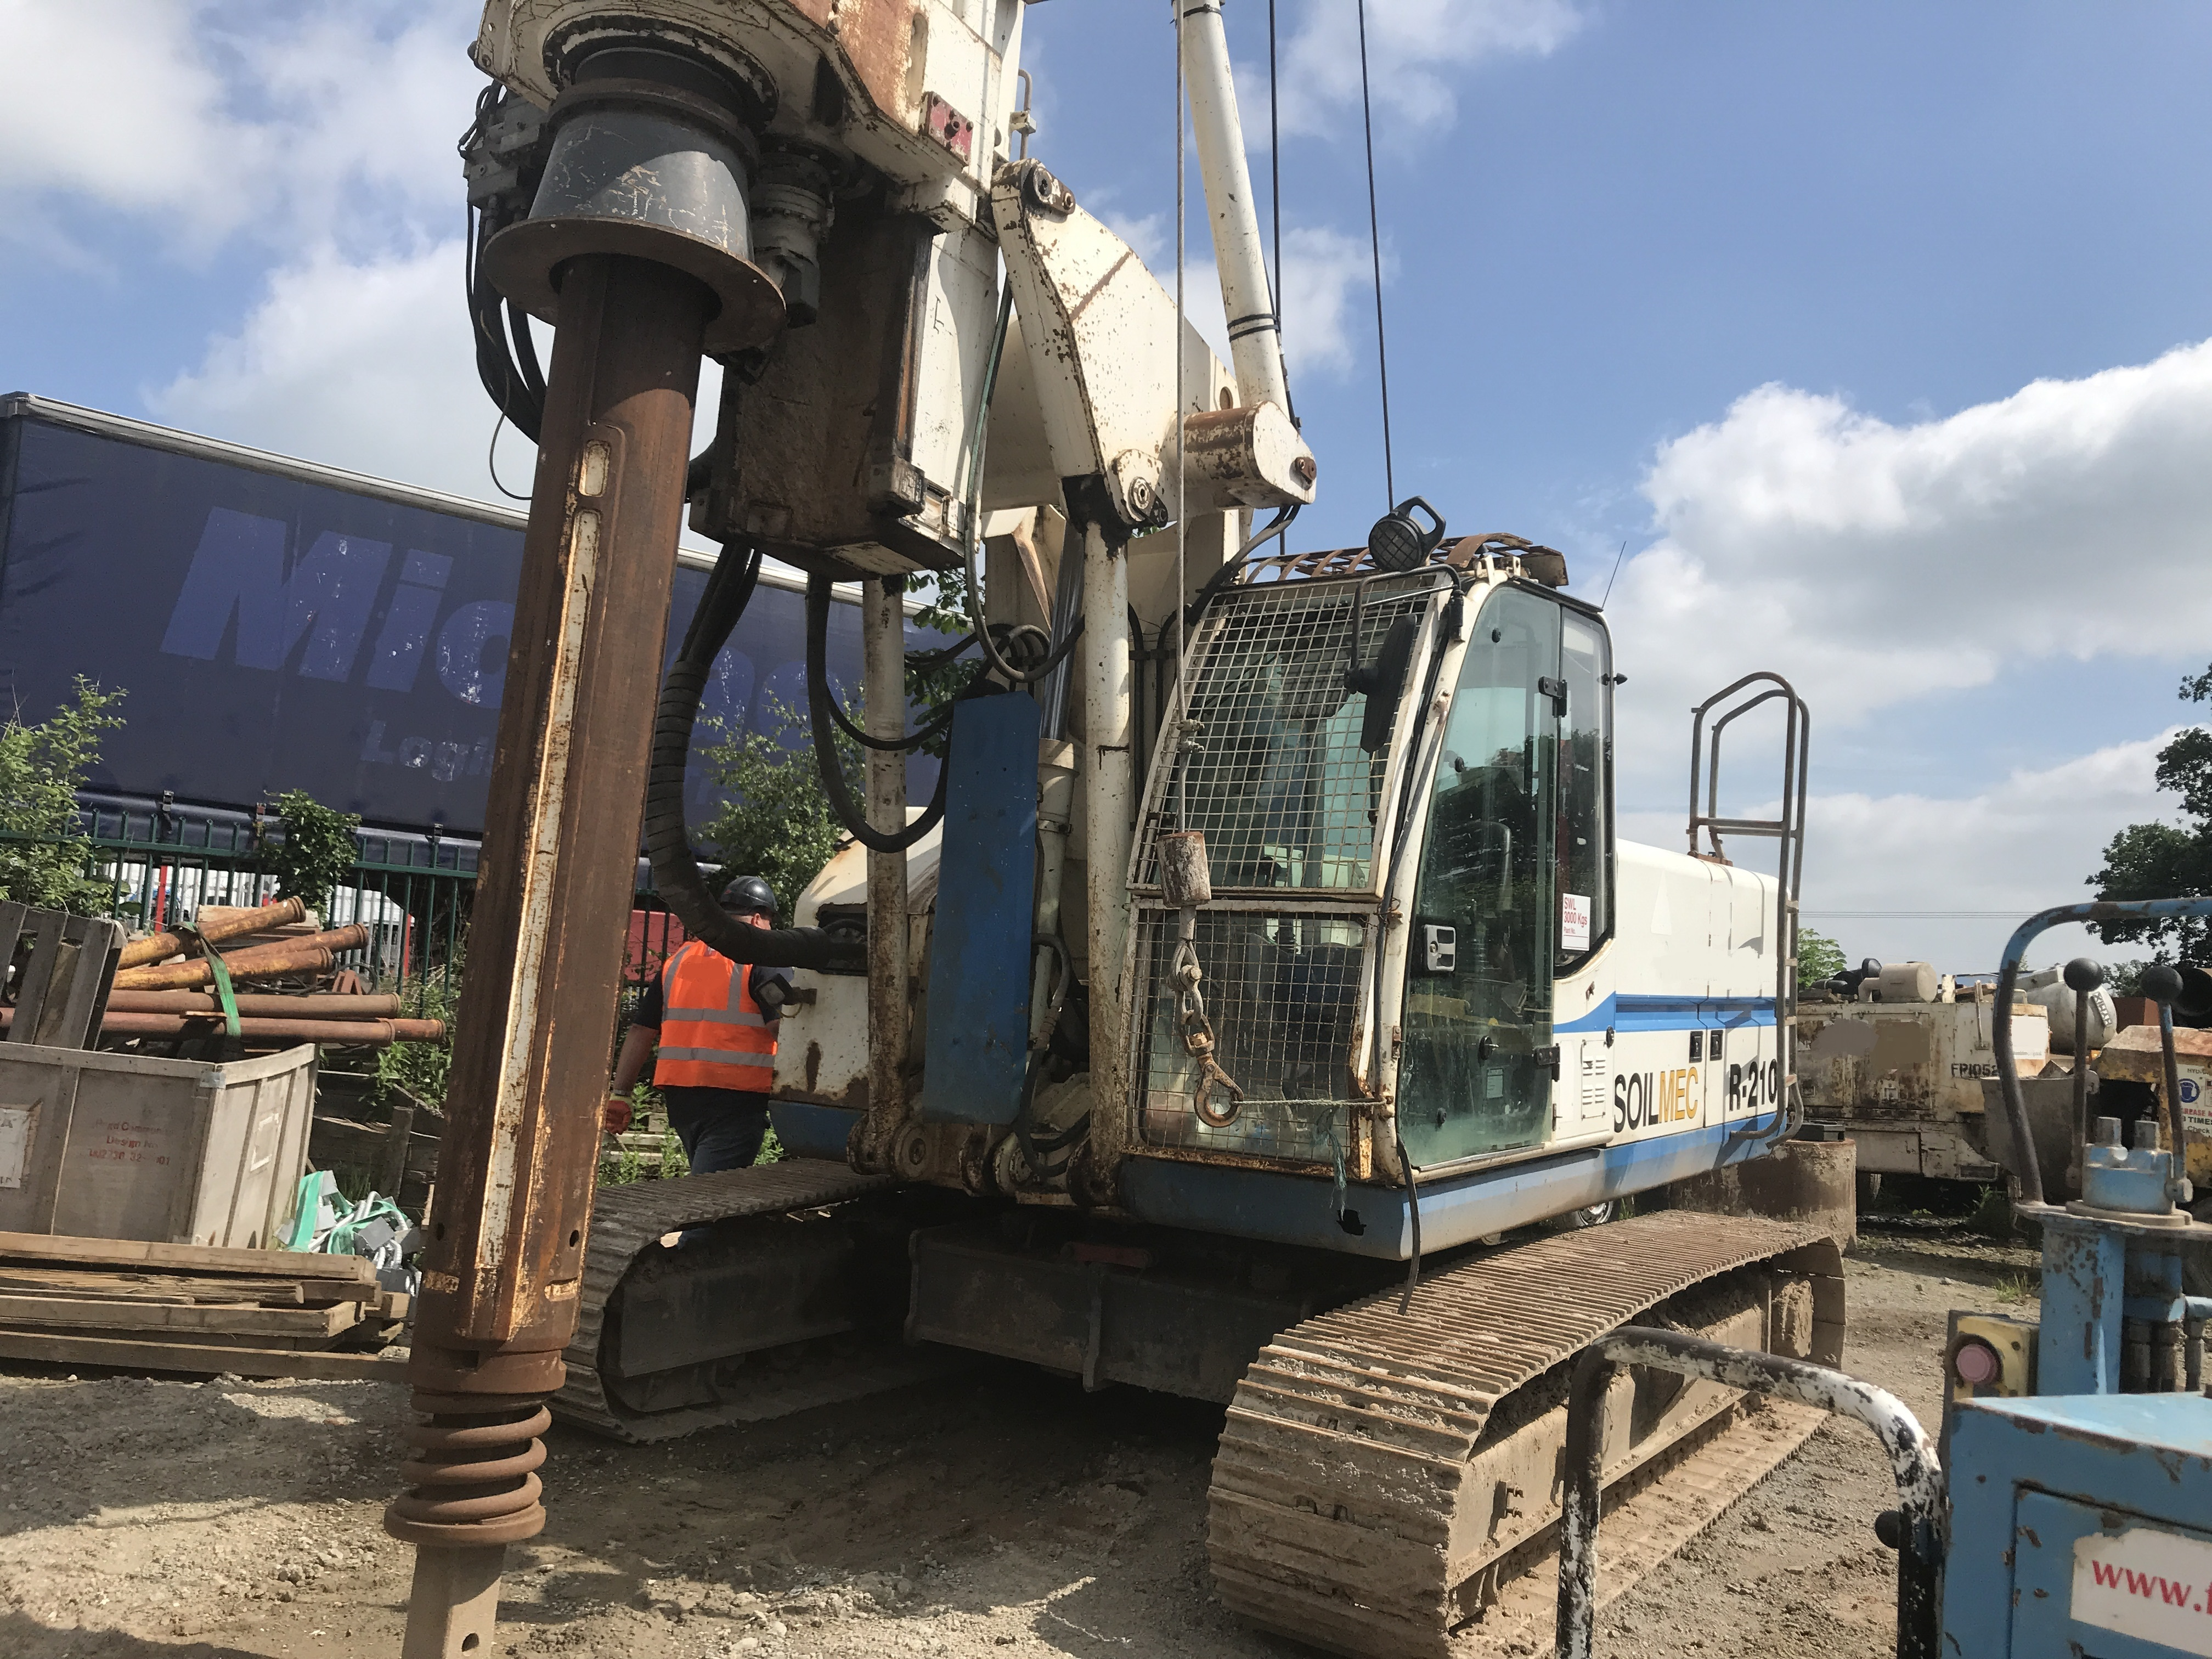 Used Soilmec R208 bored piling rig for sale